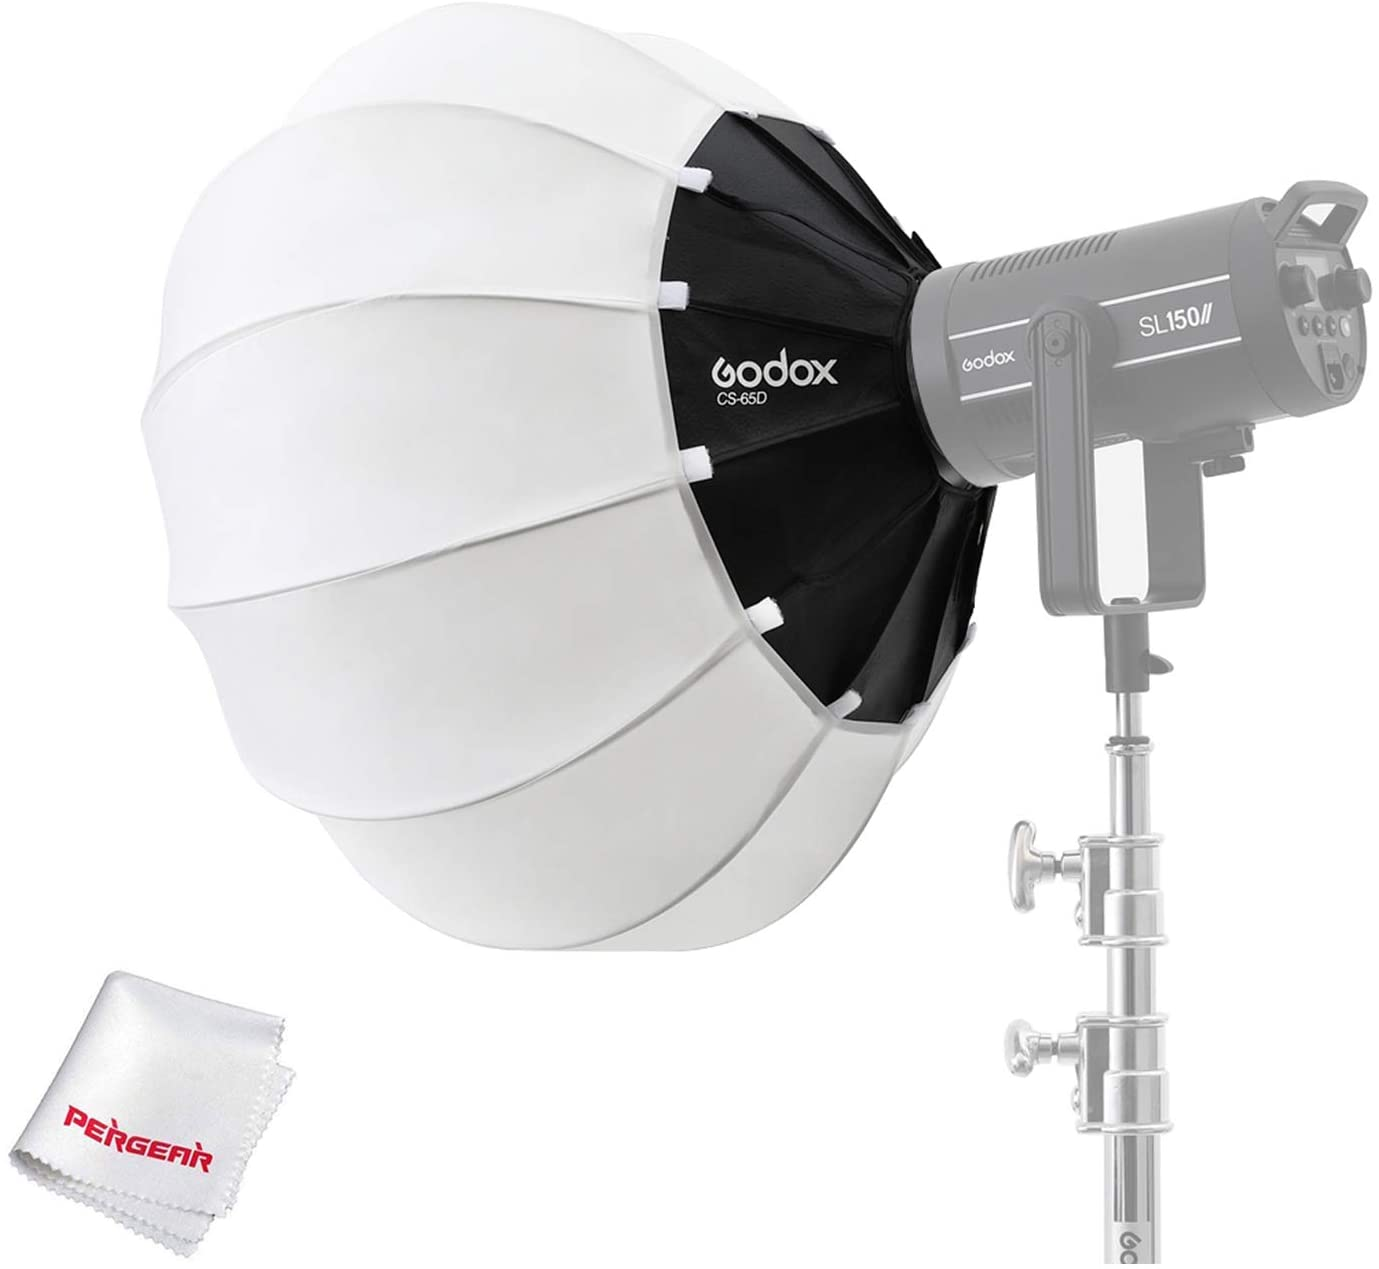 Godox CS-65D Lantern Softbox Soft Light Modifier, for Aputure 300D Mark II 120D Godox SL-60W SL150W II FV150 AD300PRO AD400PRO AD600BM VL150 VL300 and Other Bowens Mount Light